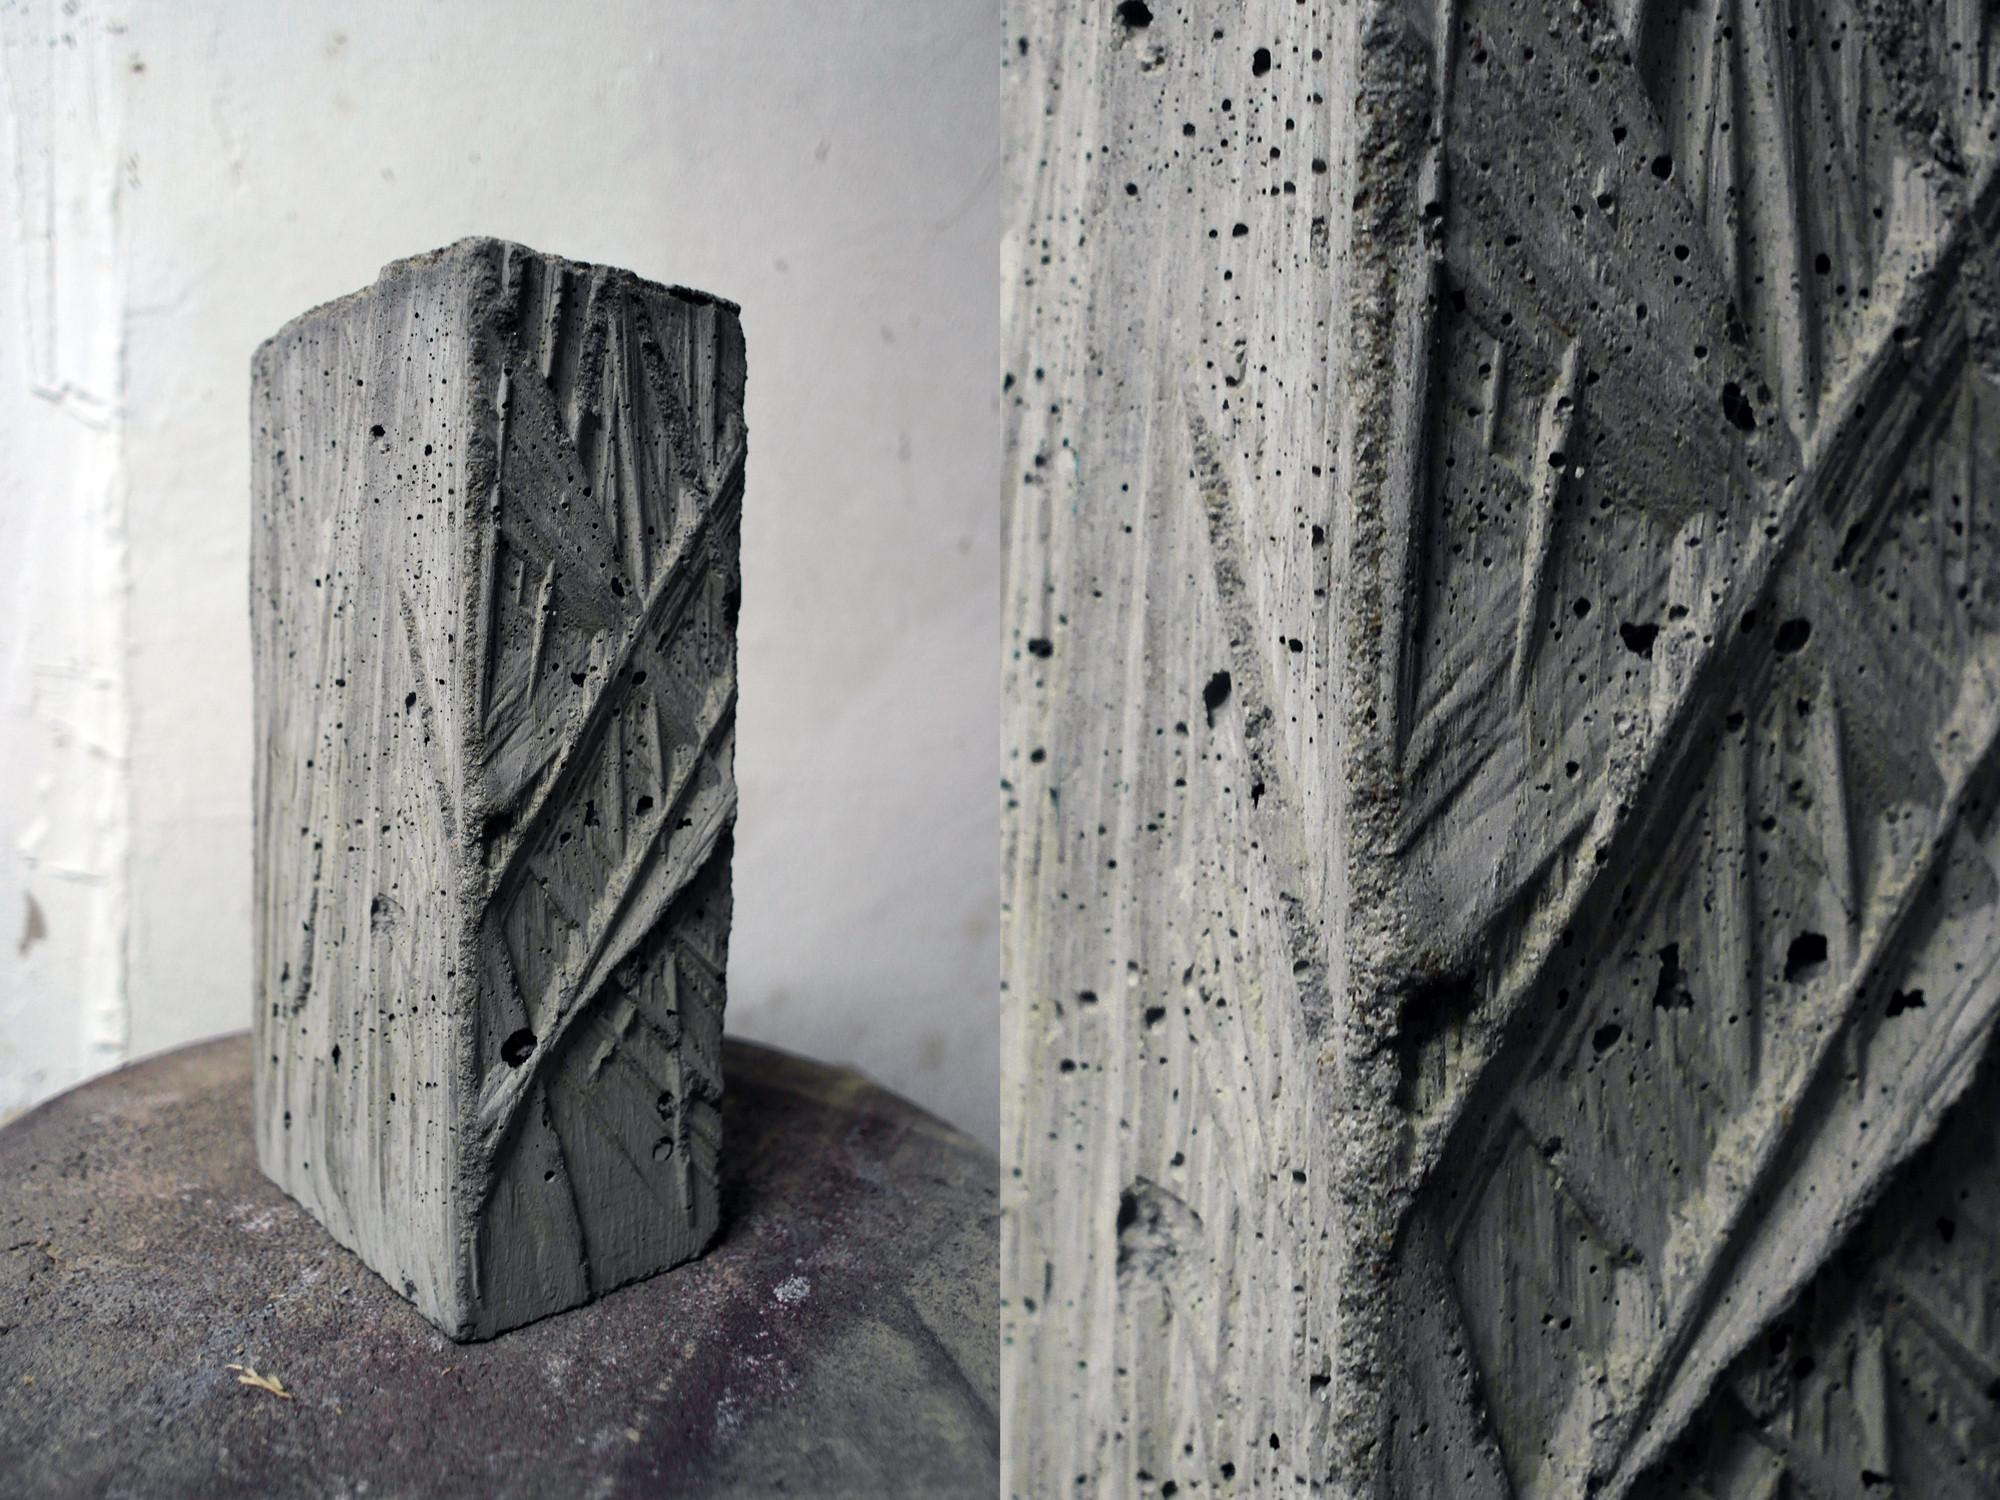 Предмет бетон углекислотная коррозия бетона